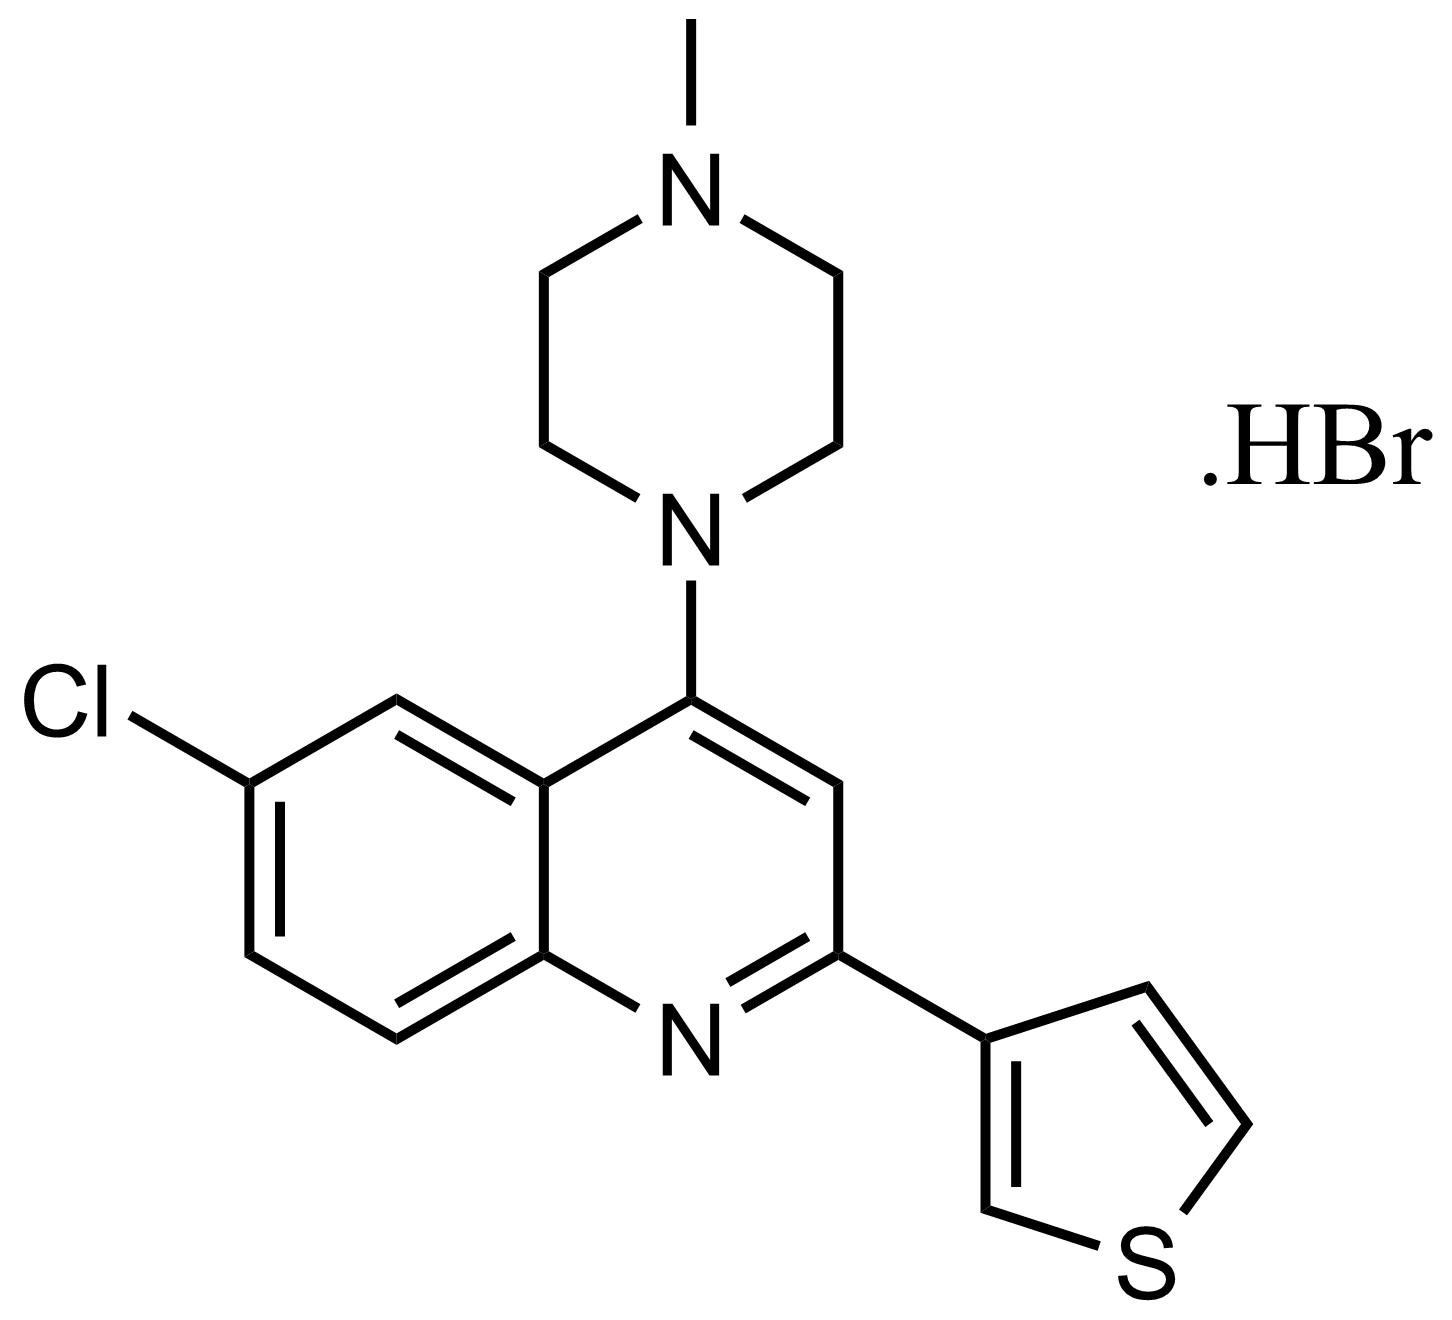 Structure of 6-Chloro-4-(4-methylpiperazin-1-yl)-2-(thiophen-3-yl)quinoline hydrobromide